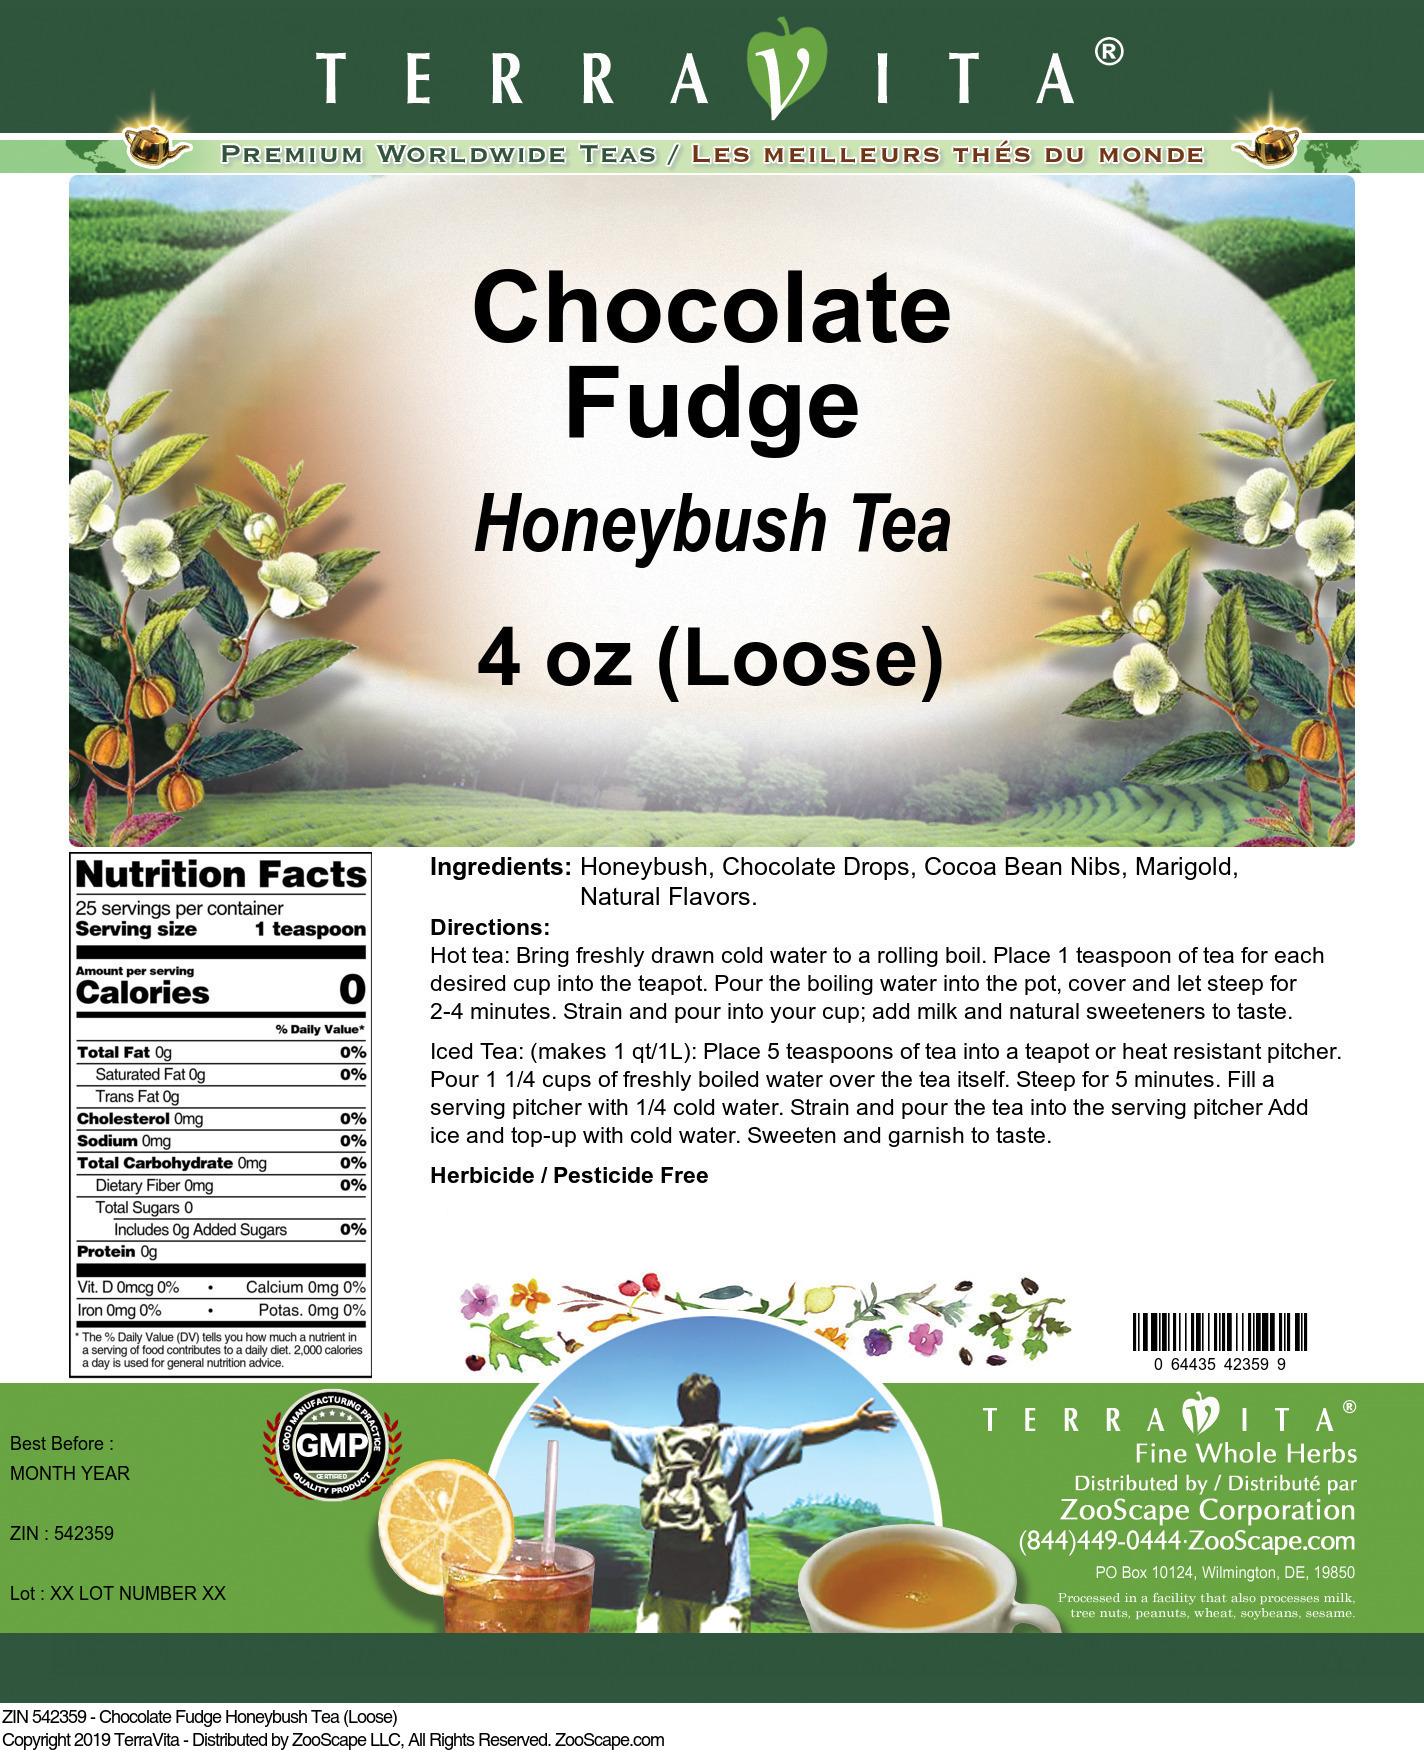 Chocolate Fudge Honeybush Tea (Loose)